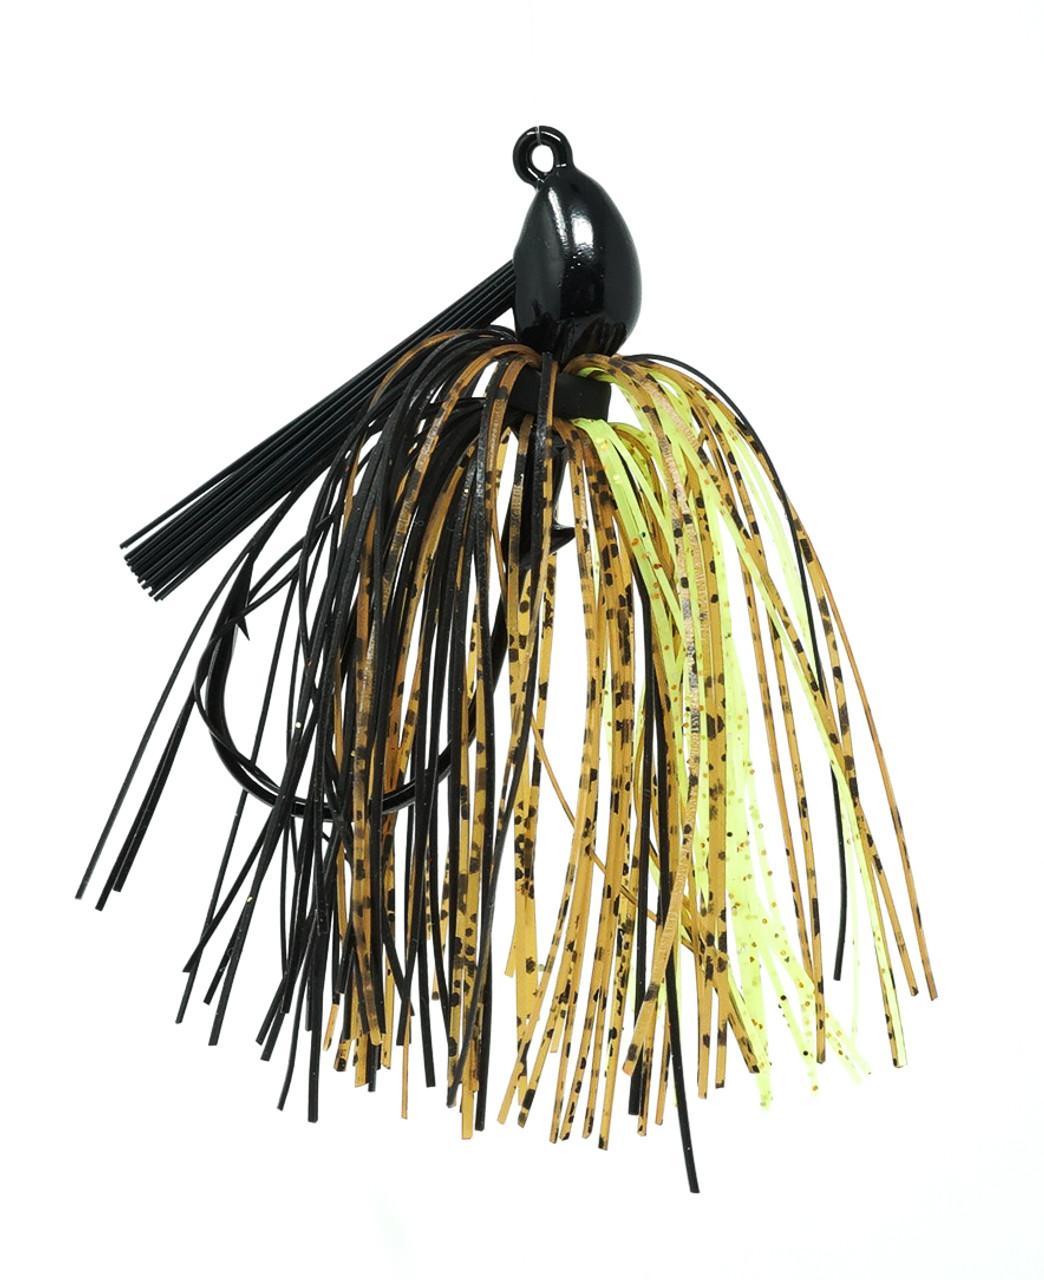 Missouri Craw Grass Jig